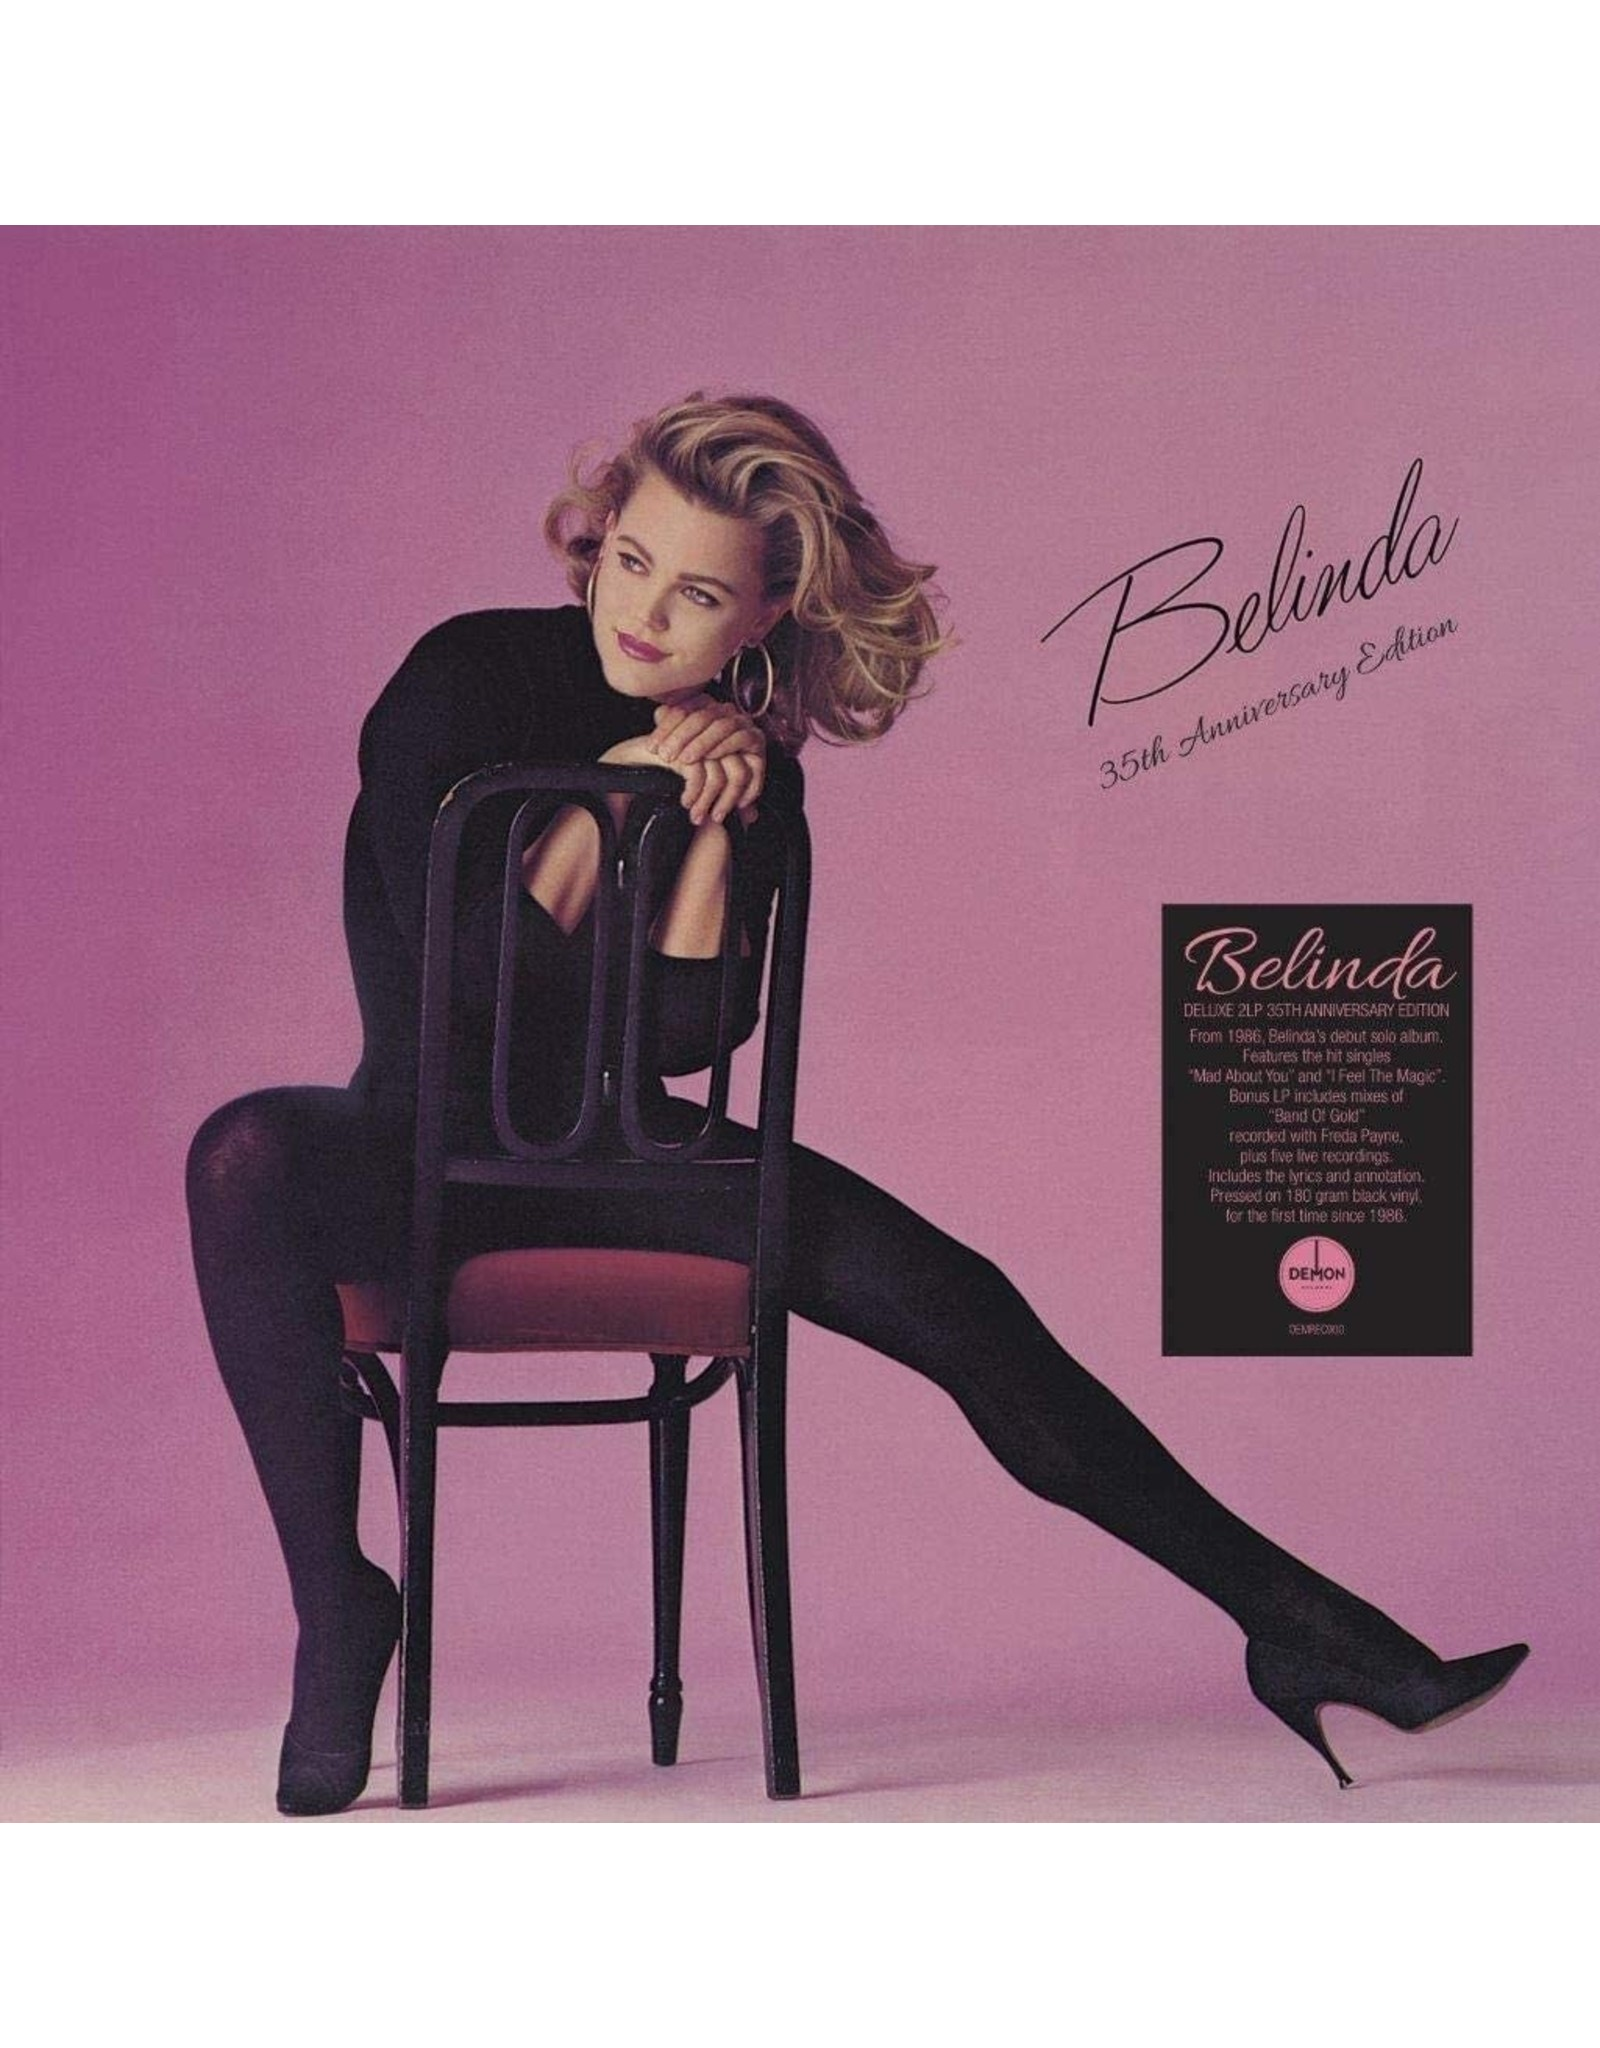 Belinda Carlisle - Belinda (35th Anniversary) [Expanded Edition]